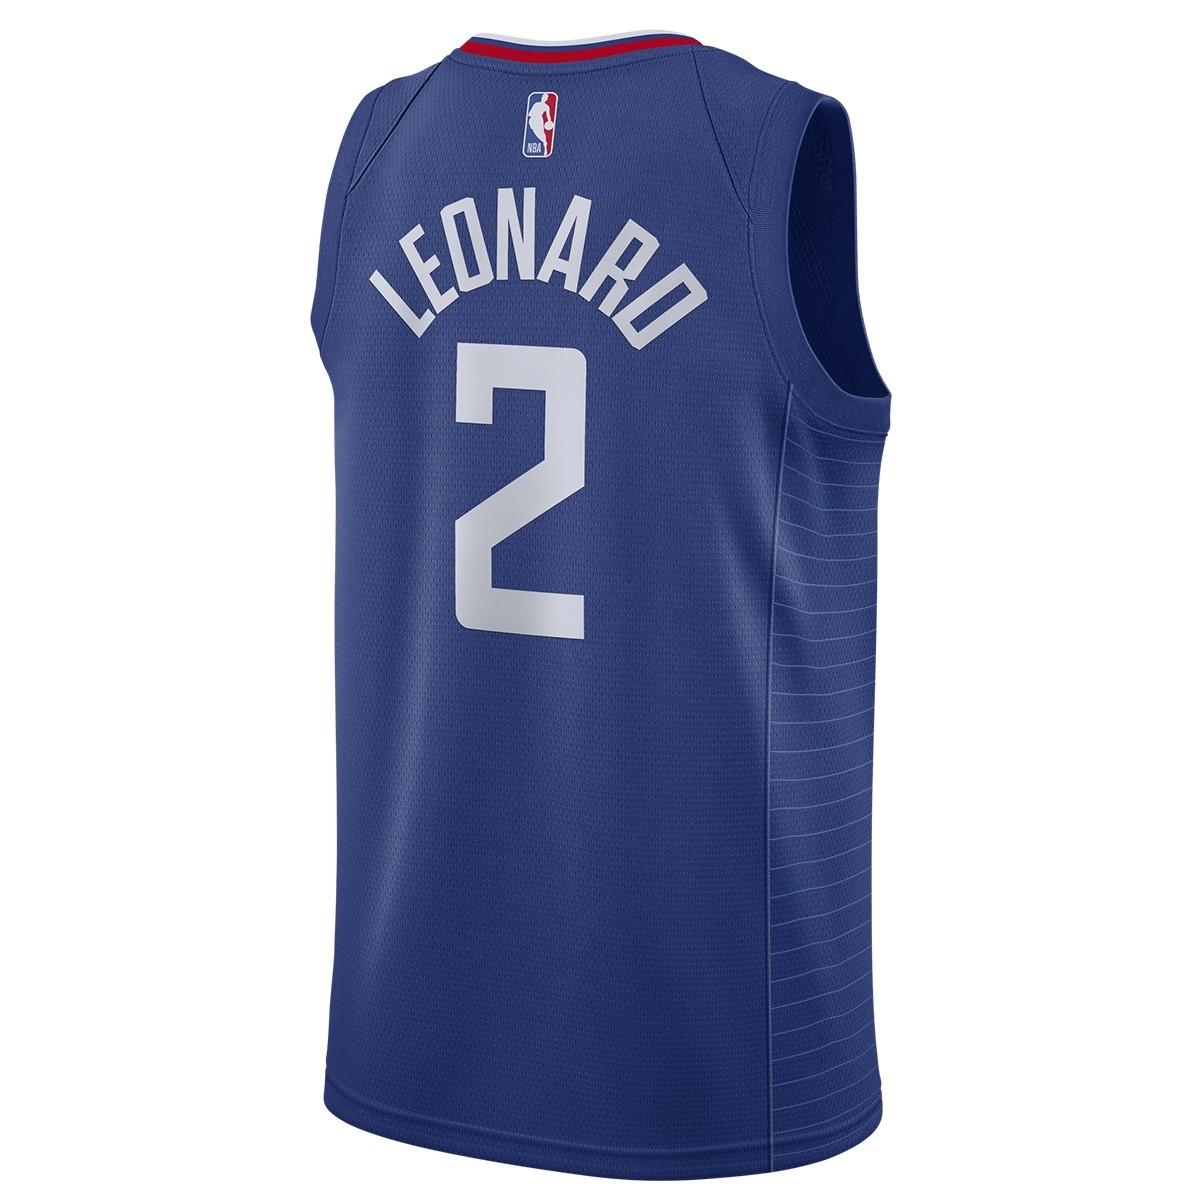 Nike NBA Los Angeles Clippers Swingman Jersey Kawhi Leonard 'Icon Edition'-CW3668-402